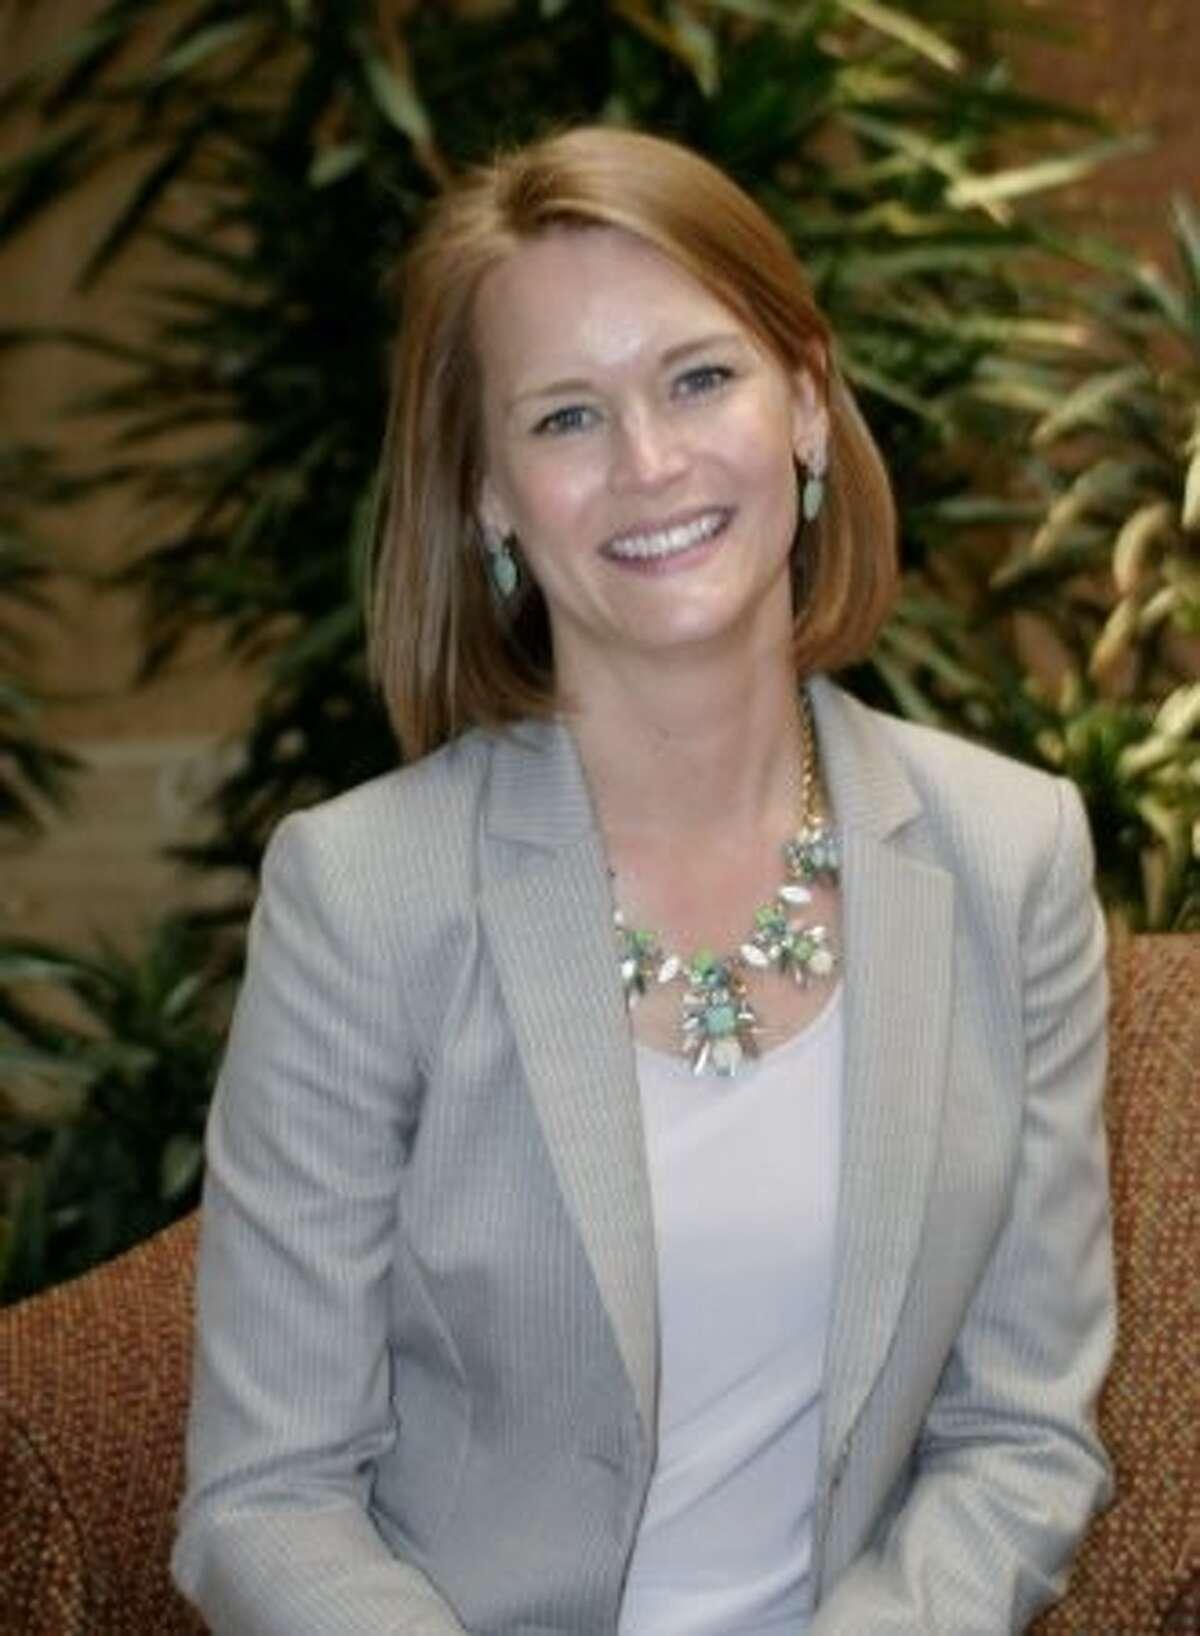 Valerie Acosta, Healthy City executive director